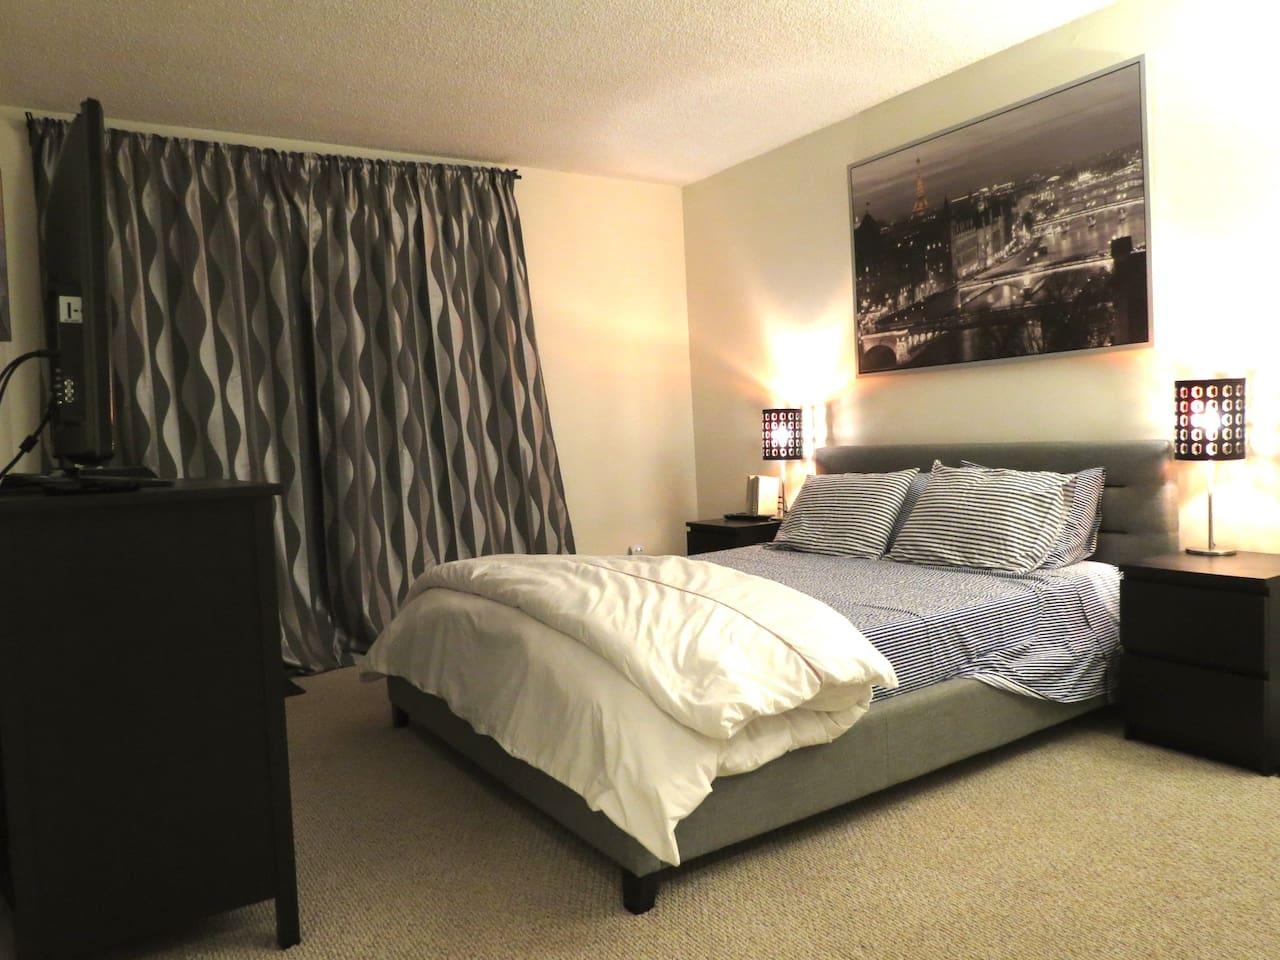 Queen memory foam mattress & crisp Percale sheets for a great night of sleep